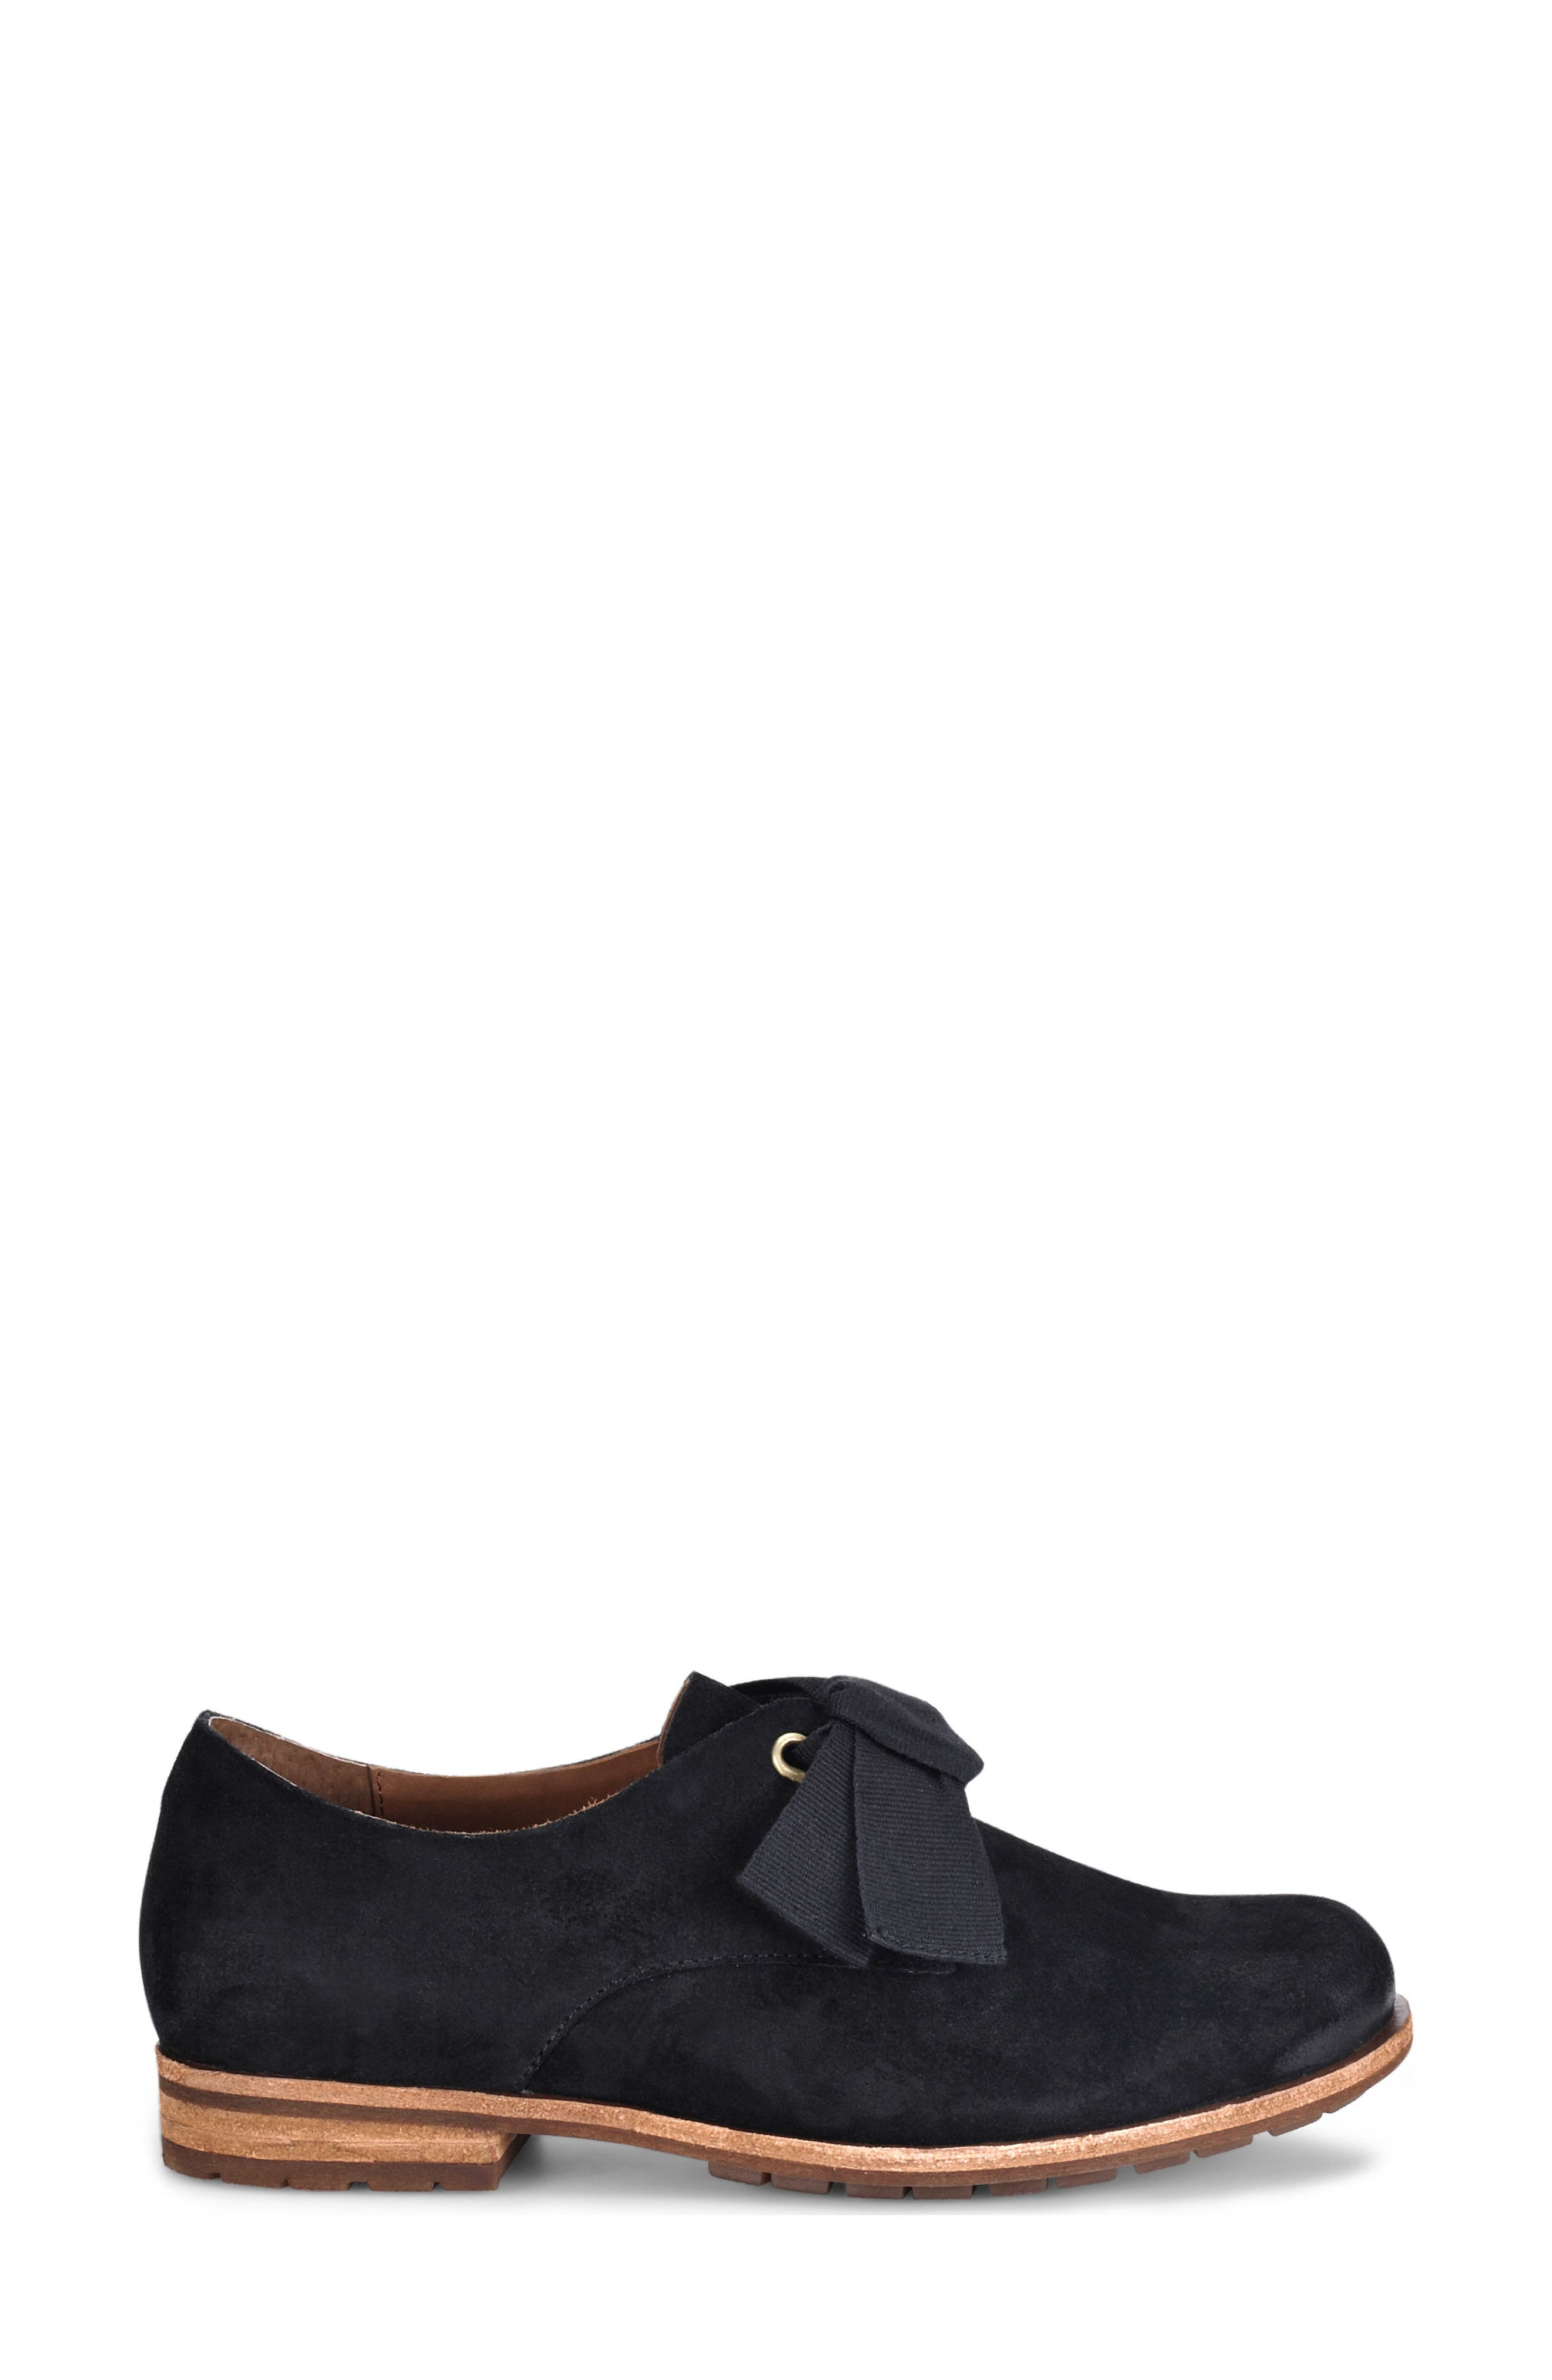 Beryl Bow Flat,                             Alternate thumbnail 3, color,                             BLACK SUEDE